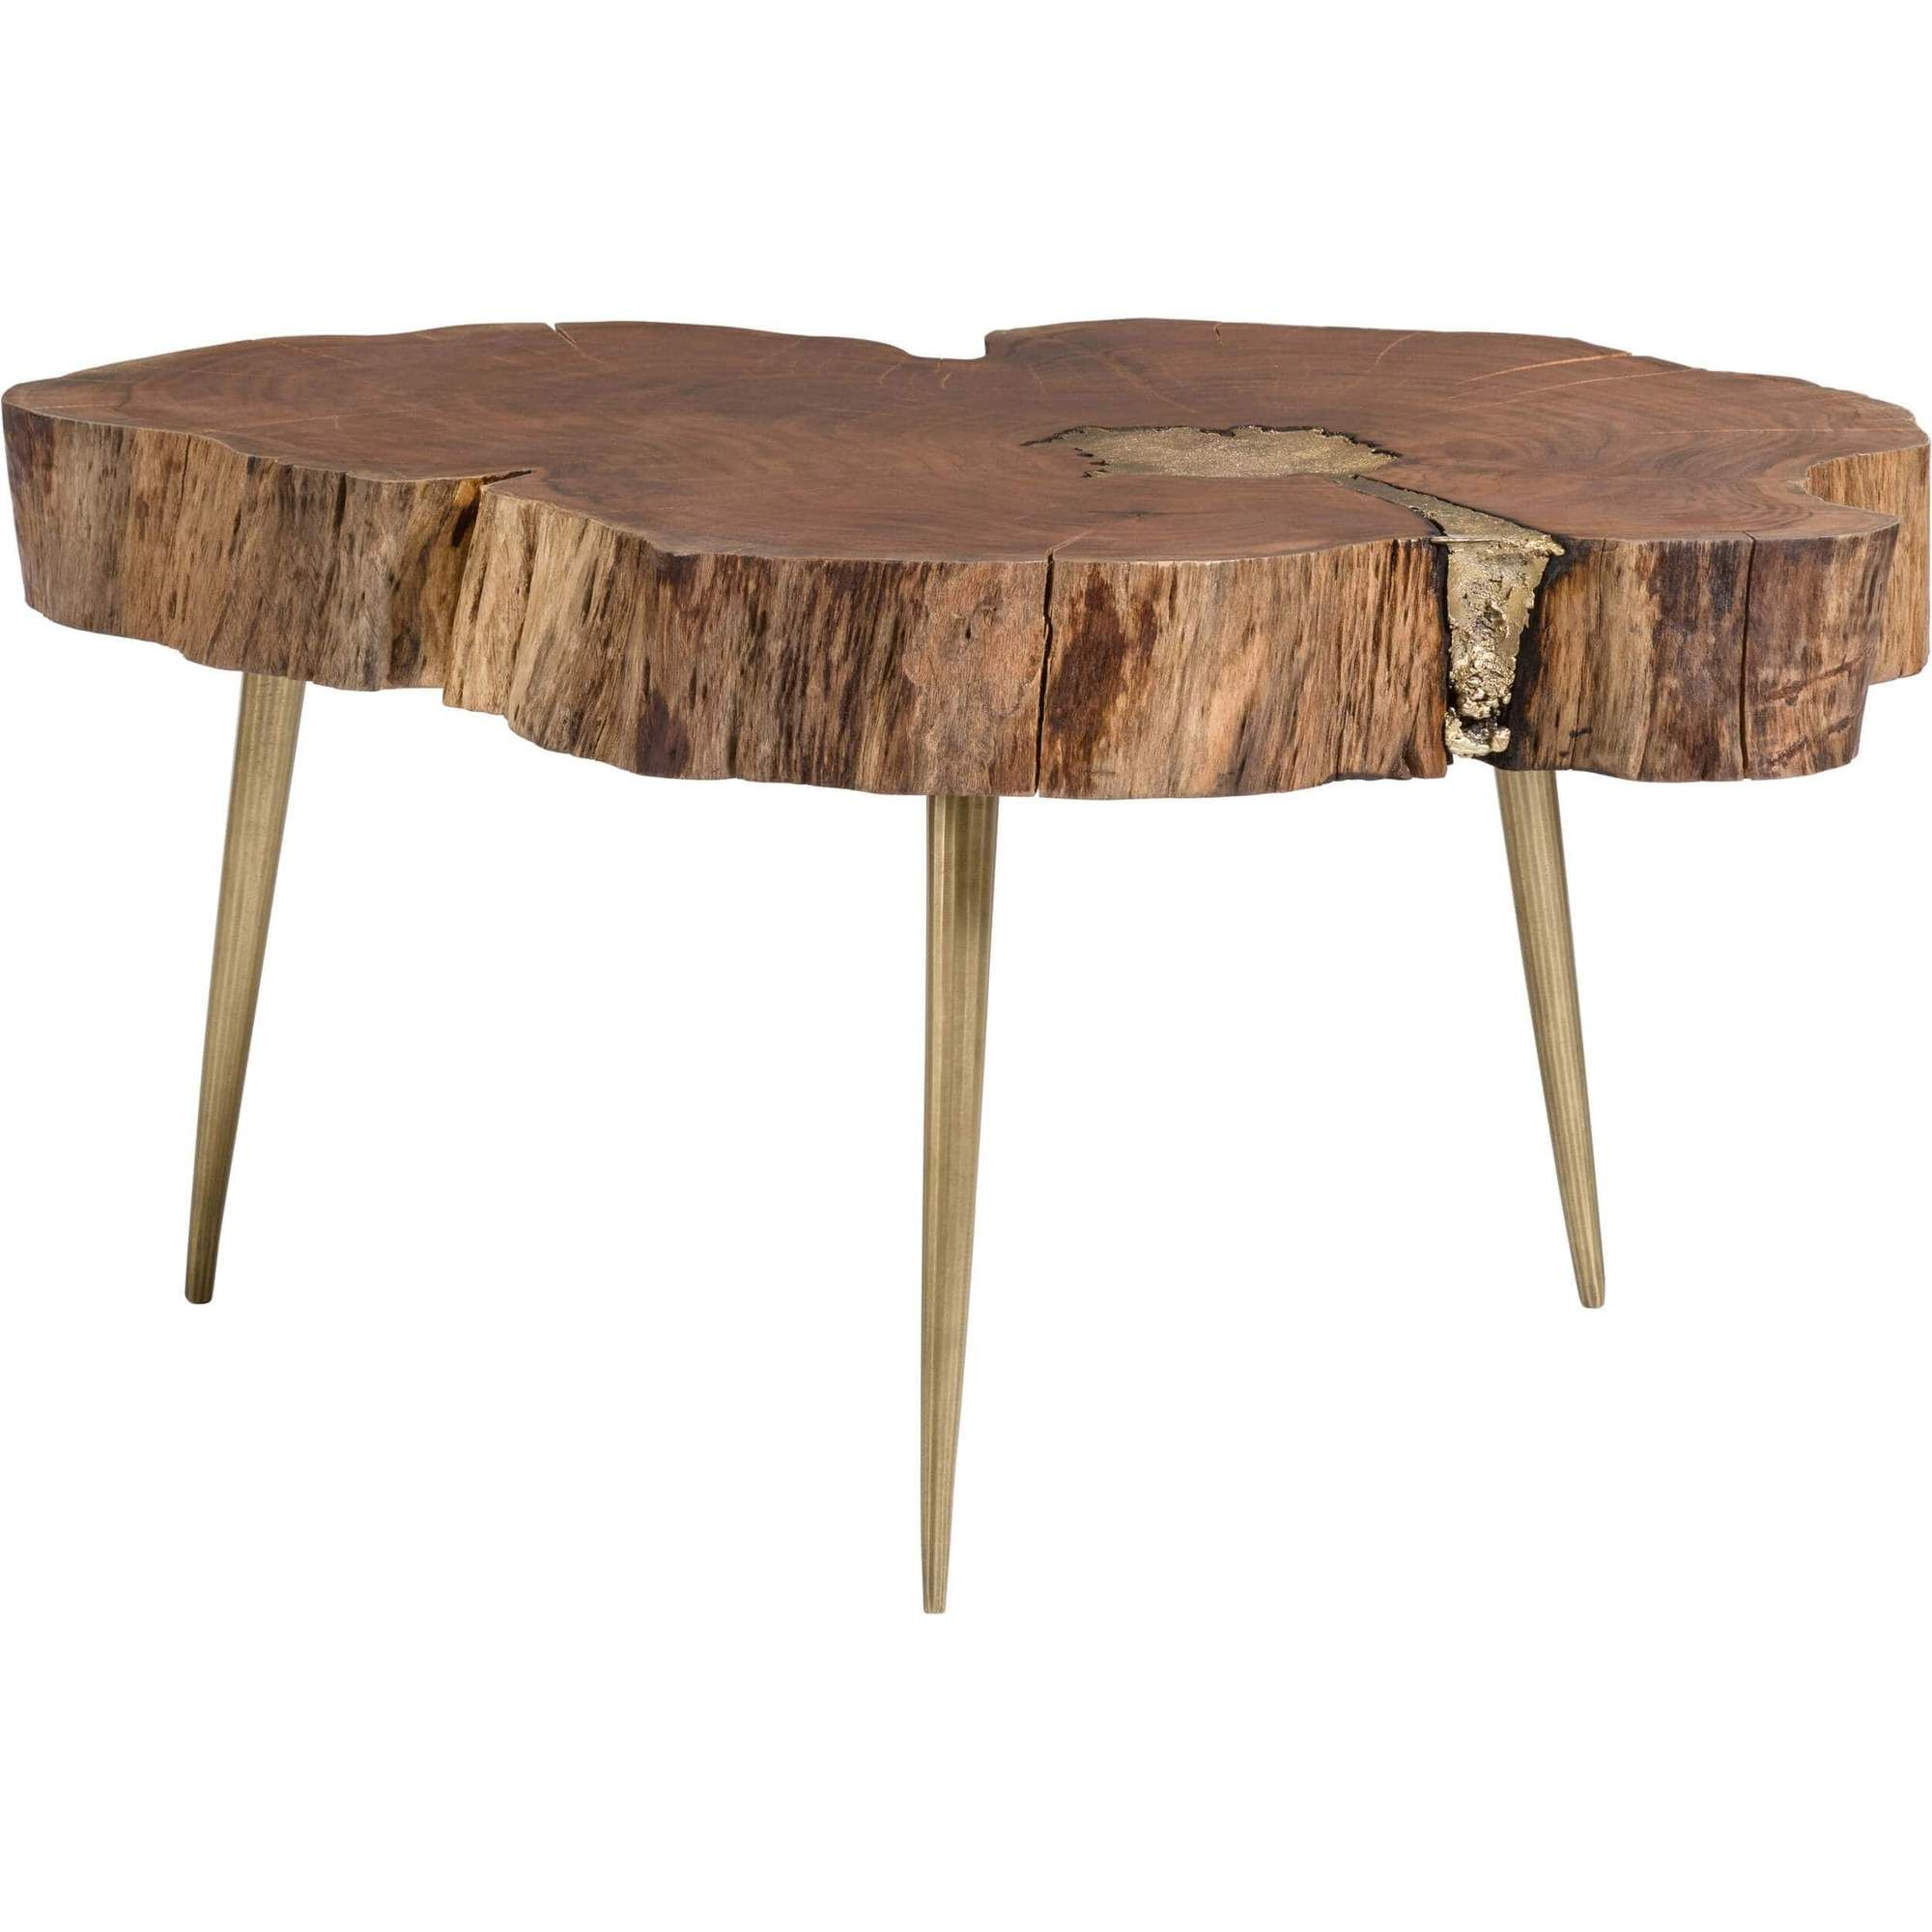 Vail Molten Coffee Table Brass Modern Wood Coffee Table Wood Coffee Table Design Coffee Table Wood [ 2000 x 2000 Pixel ]